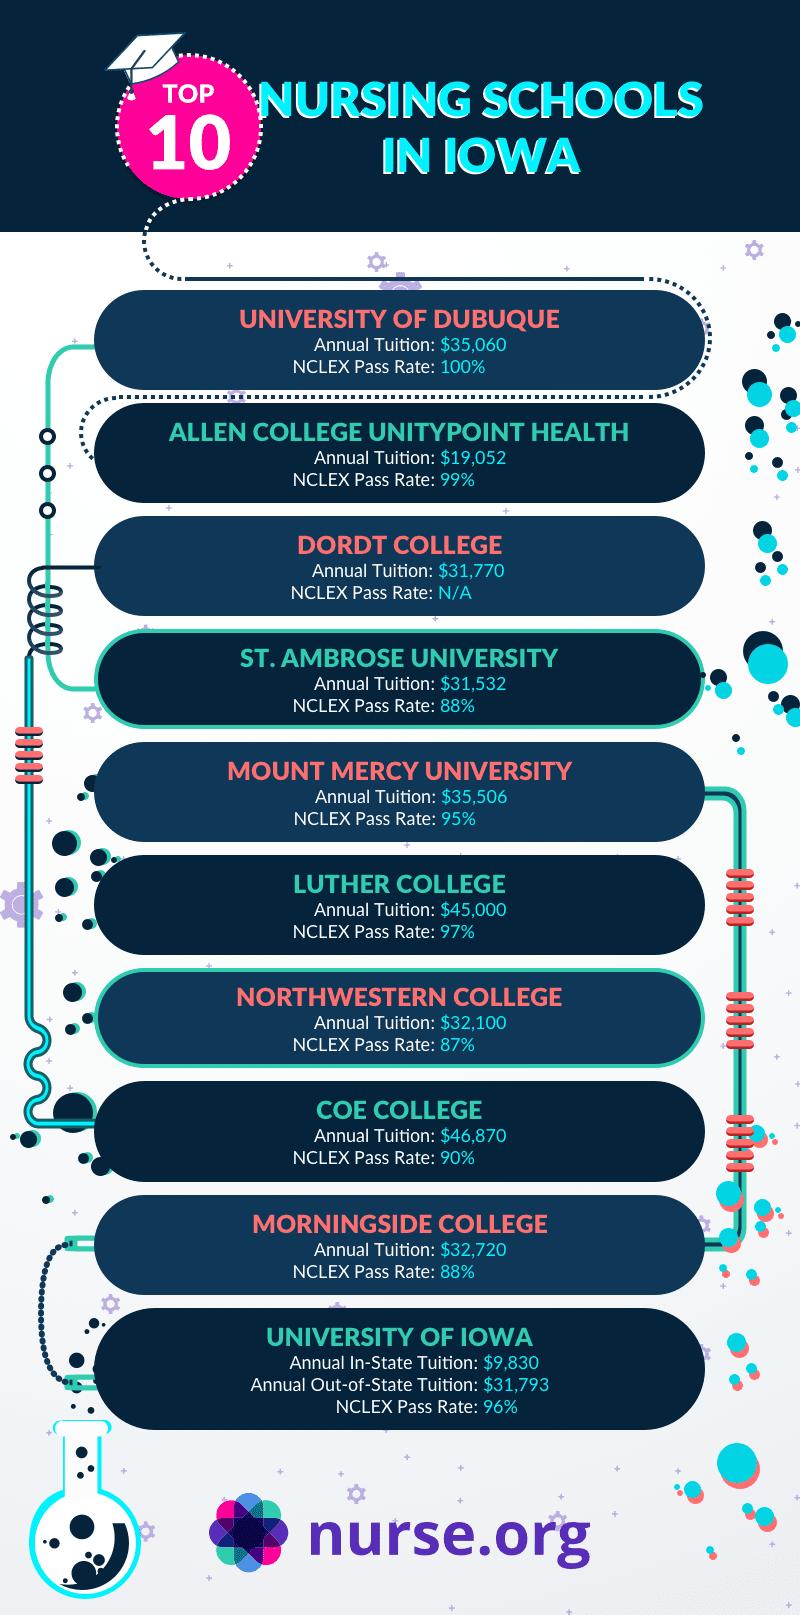 Infographic listing the top nursing schools in Iowa